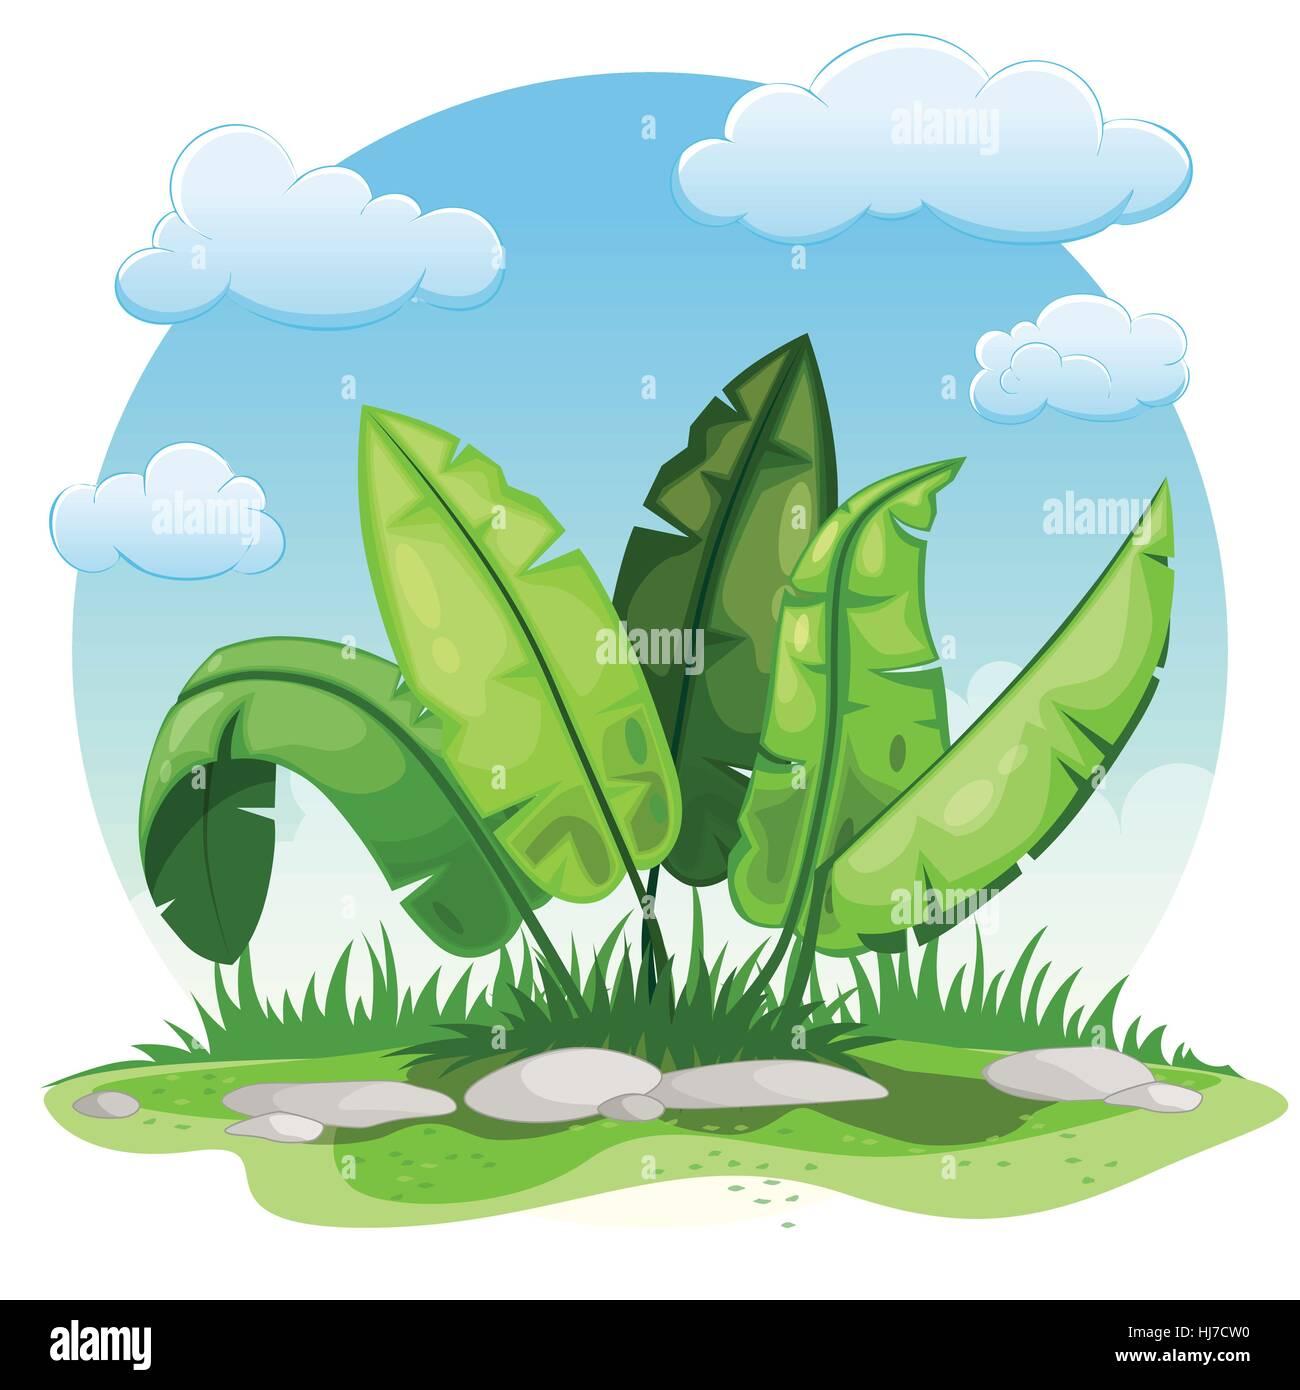 Illustration de plantes dessin animé Photo Stock